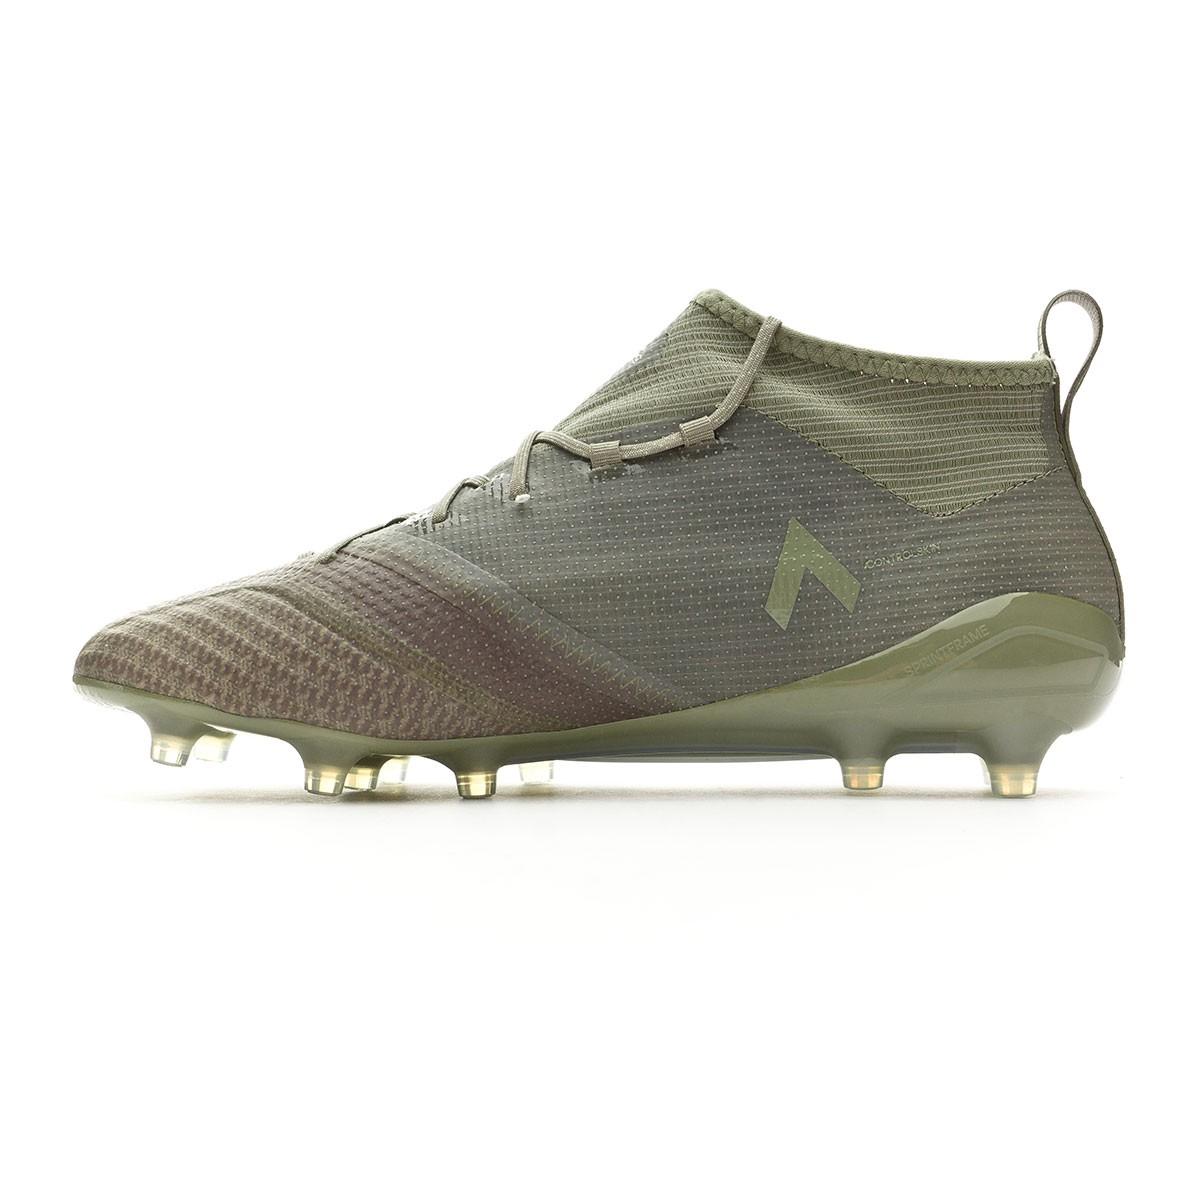 sale retailer e39a0 293cd Football Boots adidas Ace 17.1 Primeknit FG Clay-Sesame - Tienda de fútbol  Fútbol Emotion